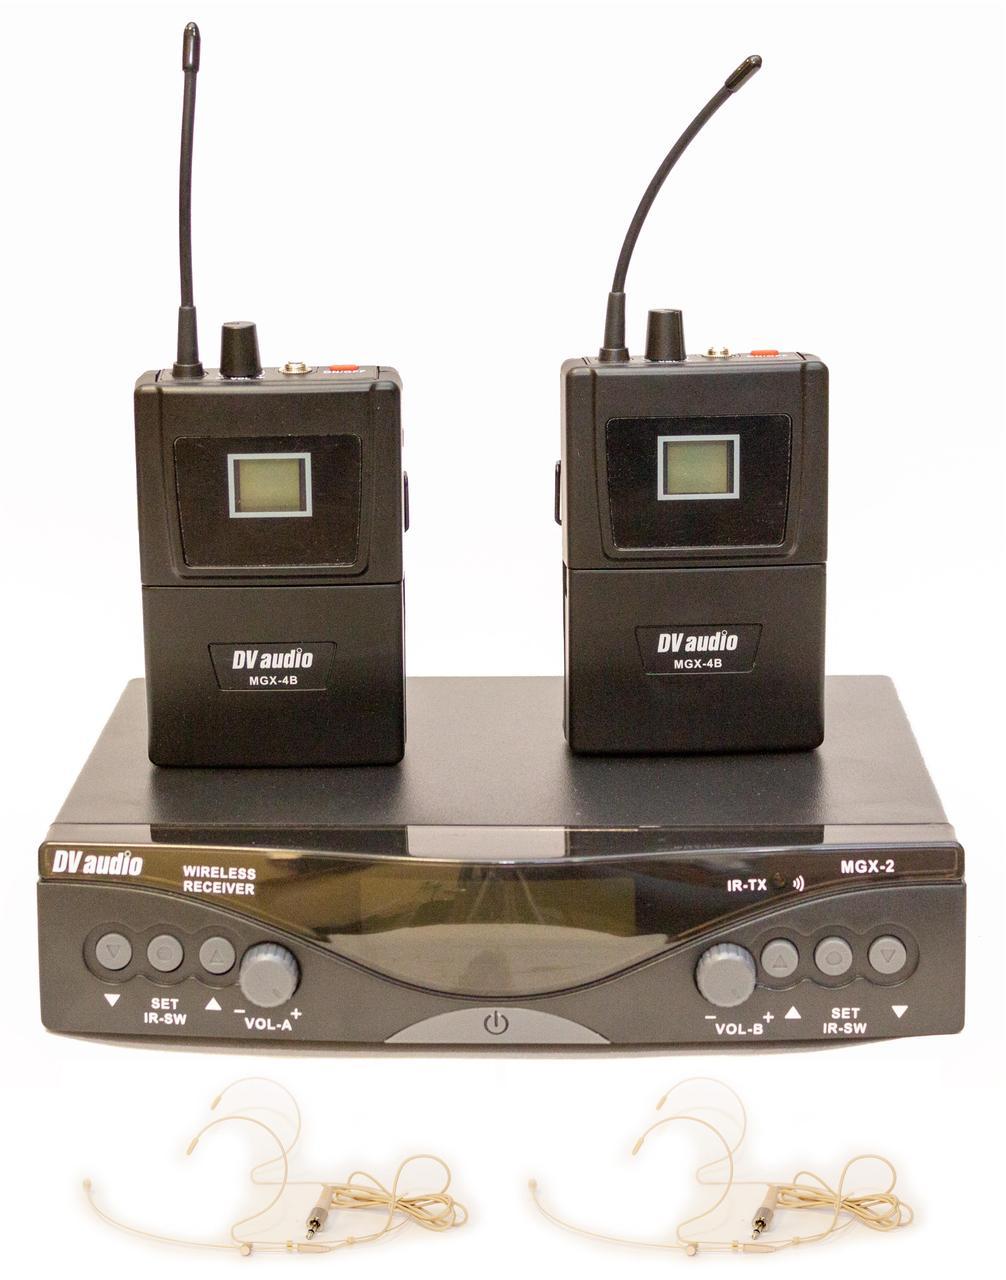 Радиосистема DV audio MGX-24B с гарнитурами